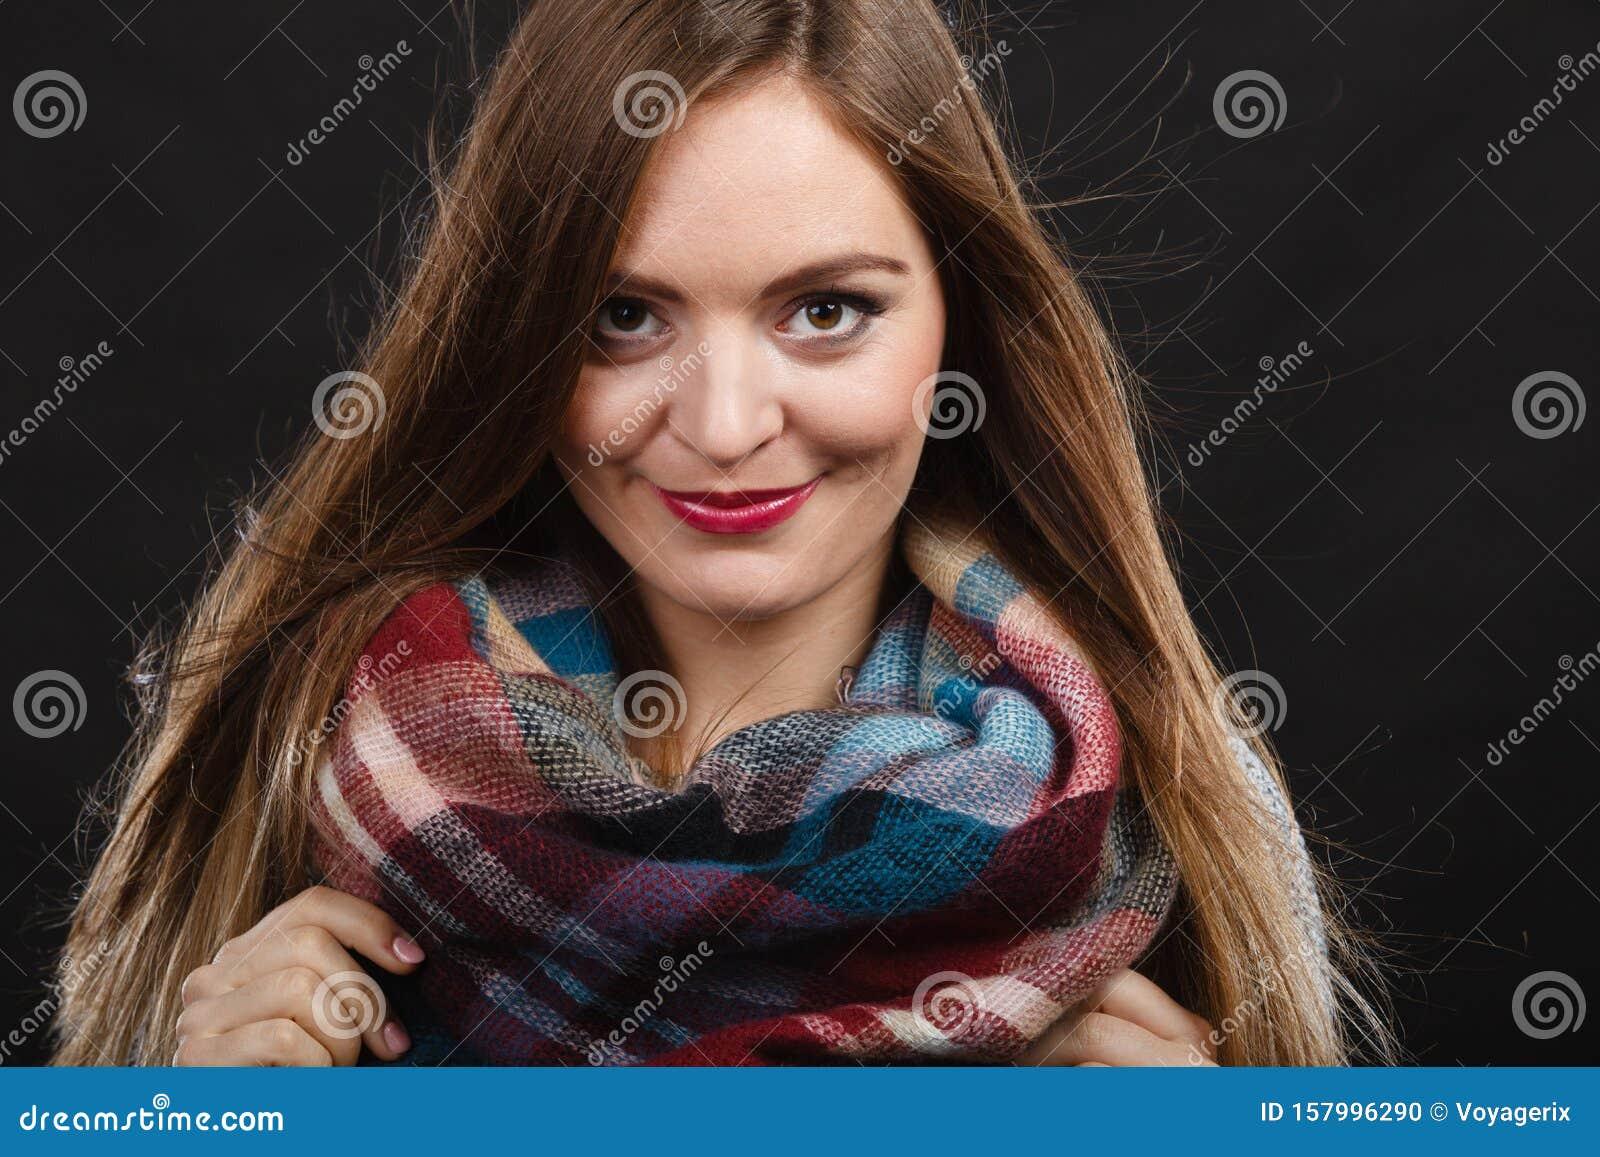 Smiling girl wearing warm wooden scarf